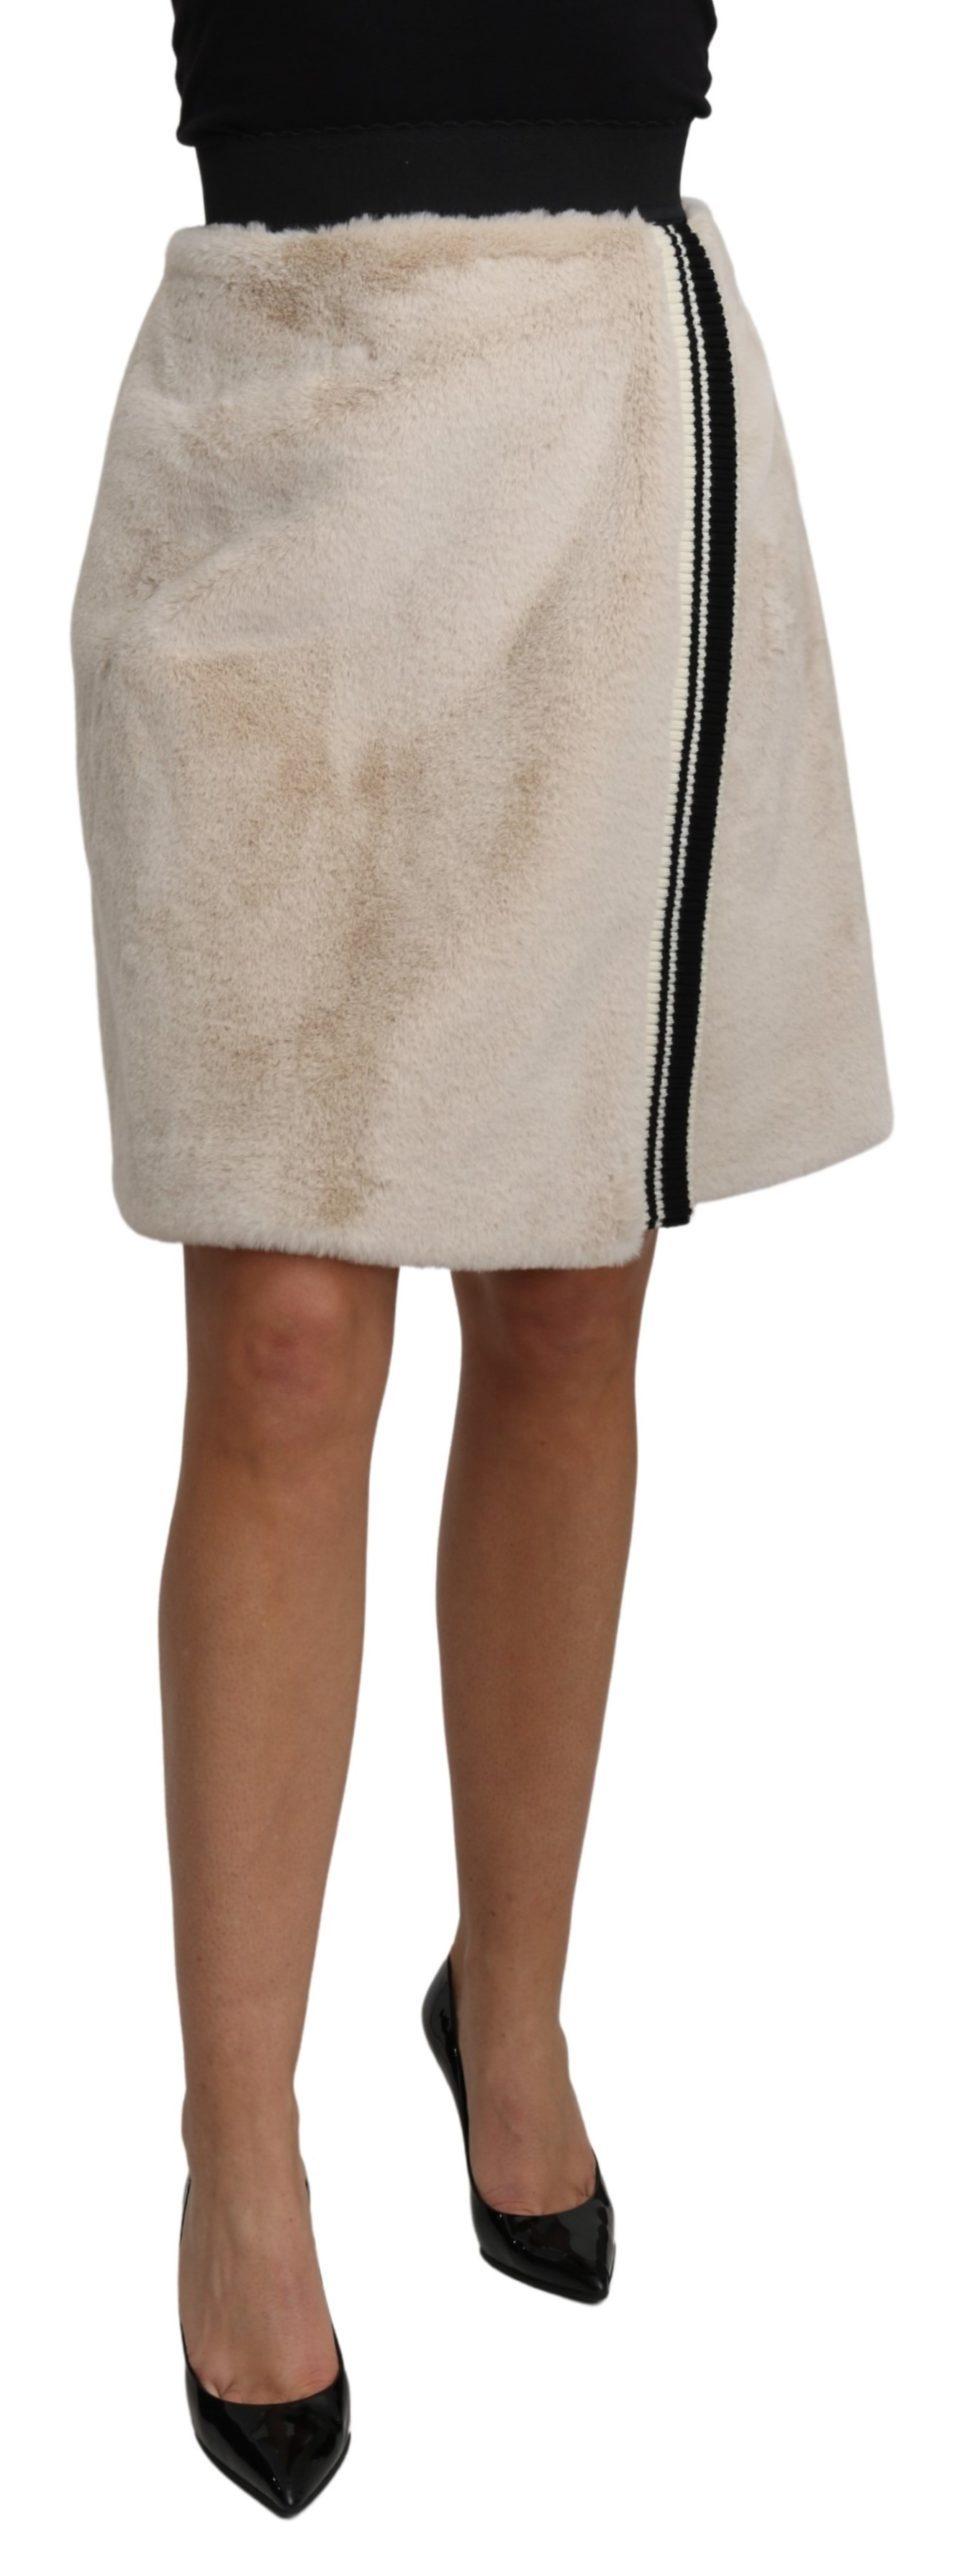 Dolce & Gabbana Women's High Waist A-line Mini Fur Skirt Beige SKI1475 - IT40 S